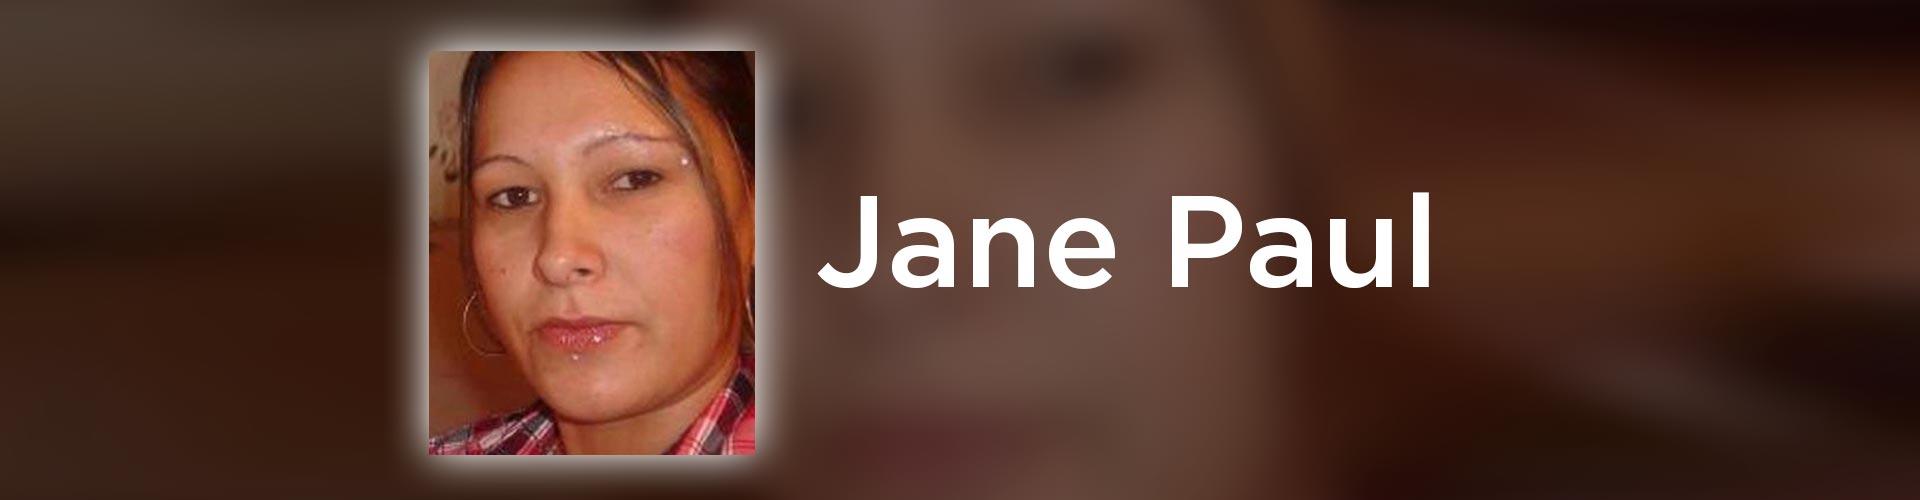 JANE-PAUL